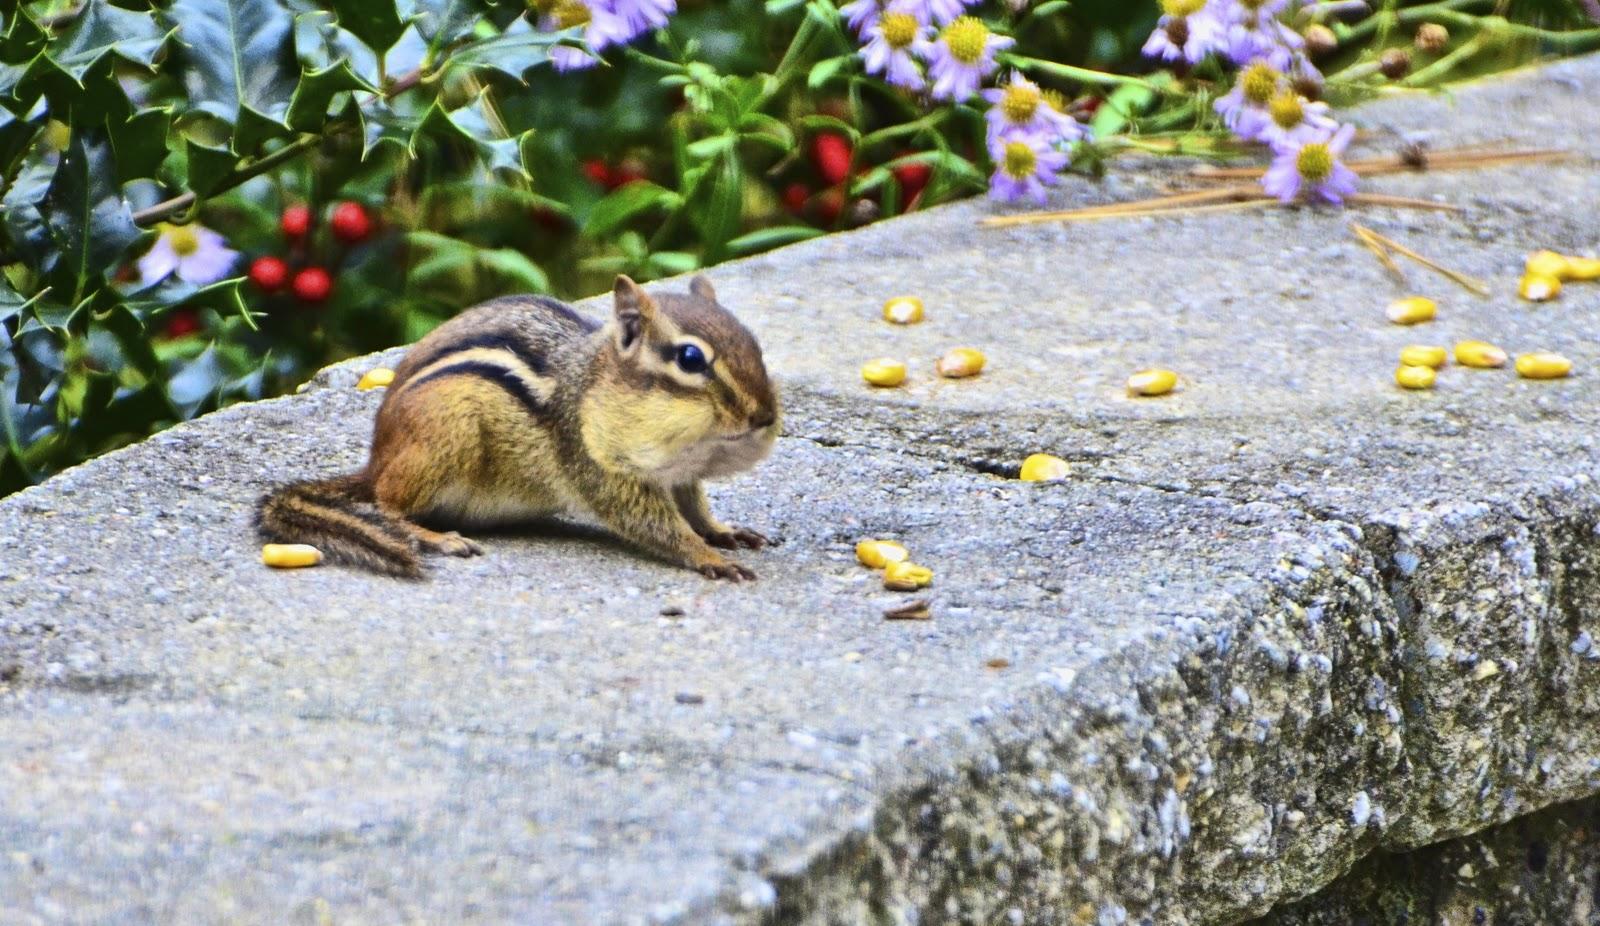 missing moments: Critter complaints